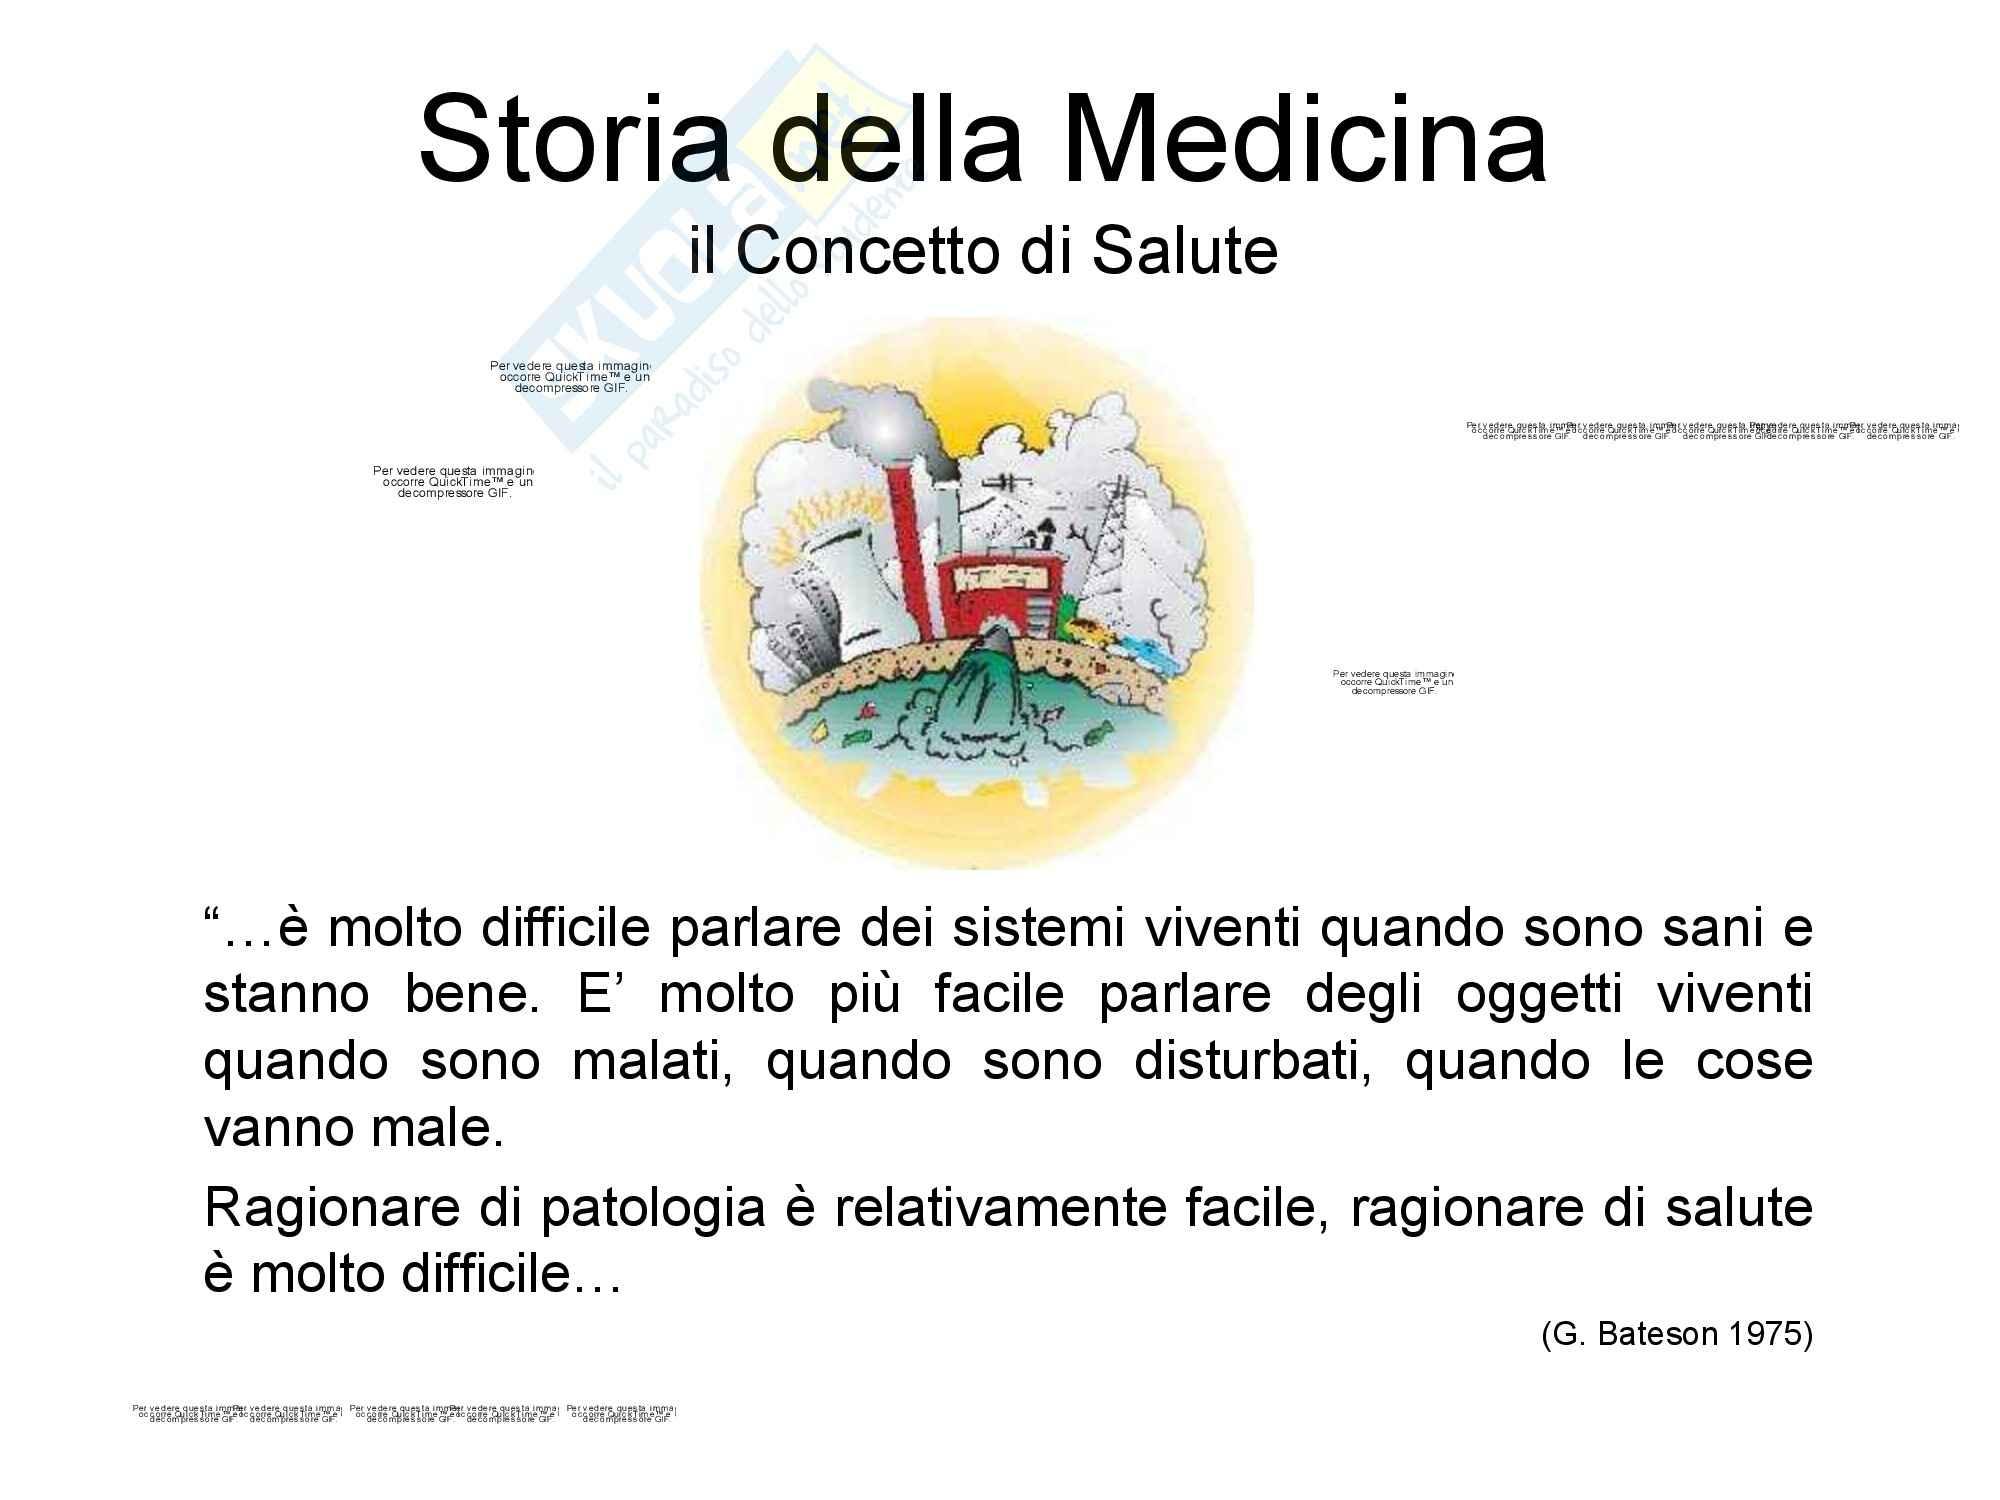 Storia della medicina - La salute Pag. 6